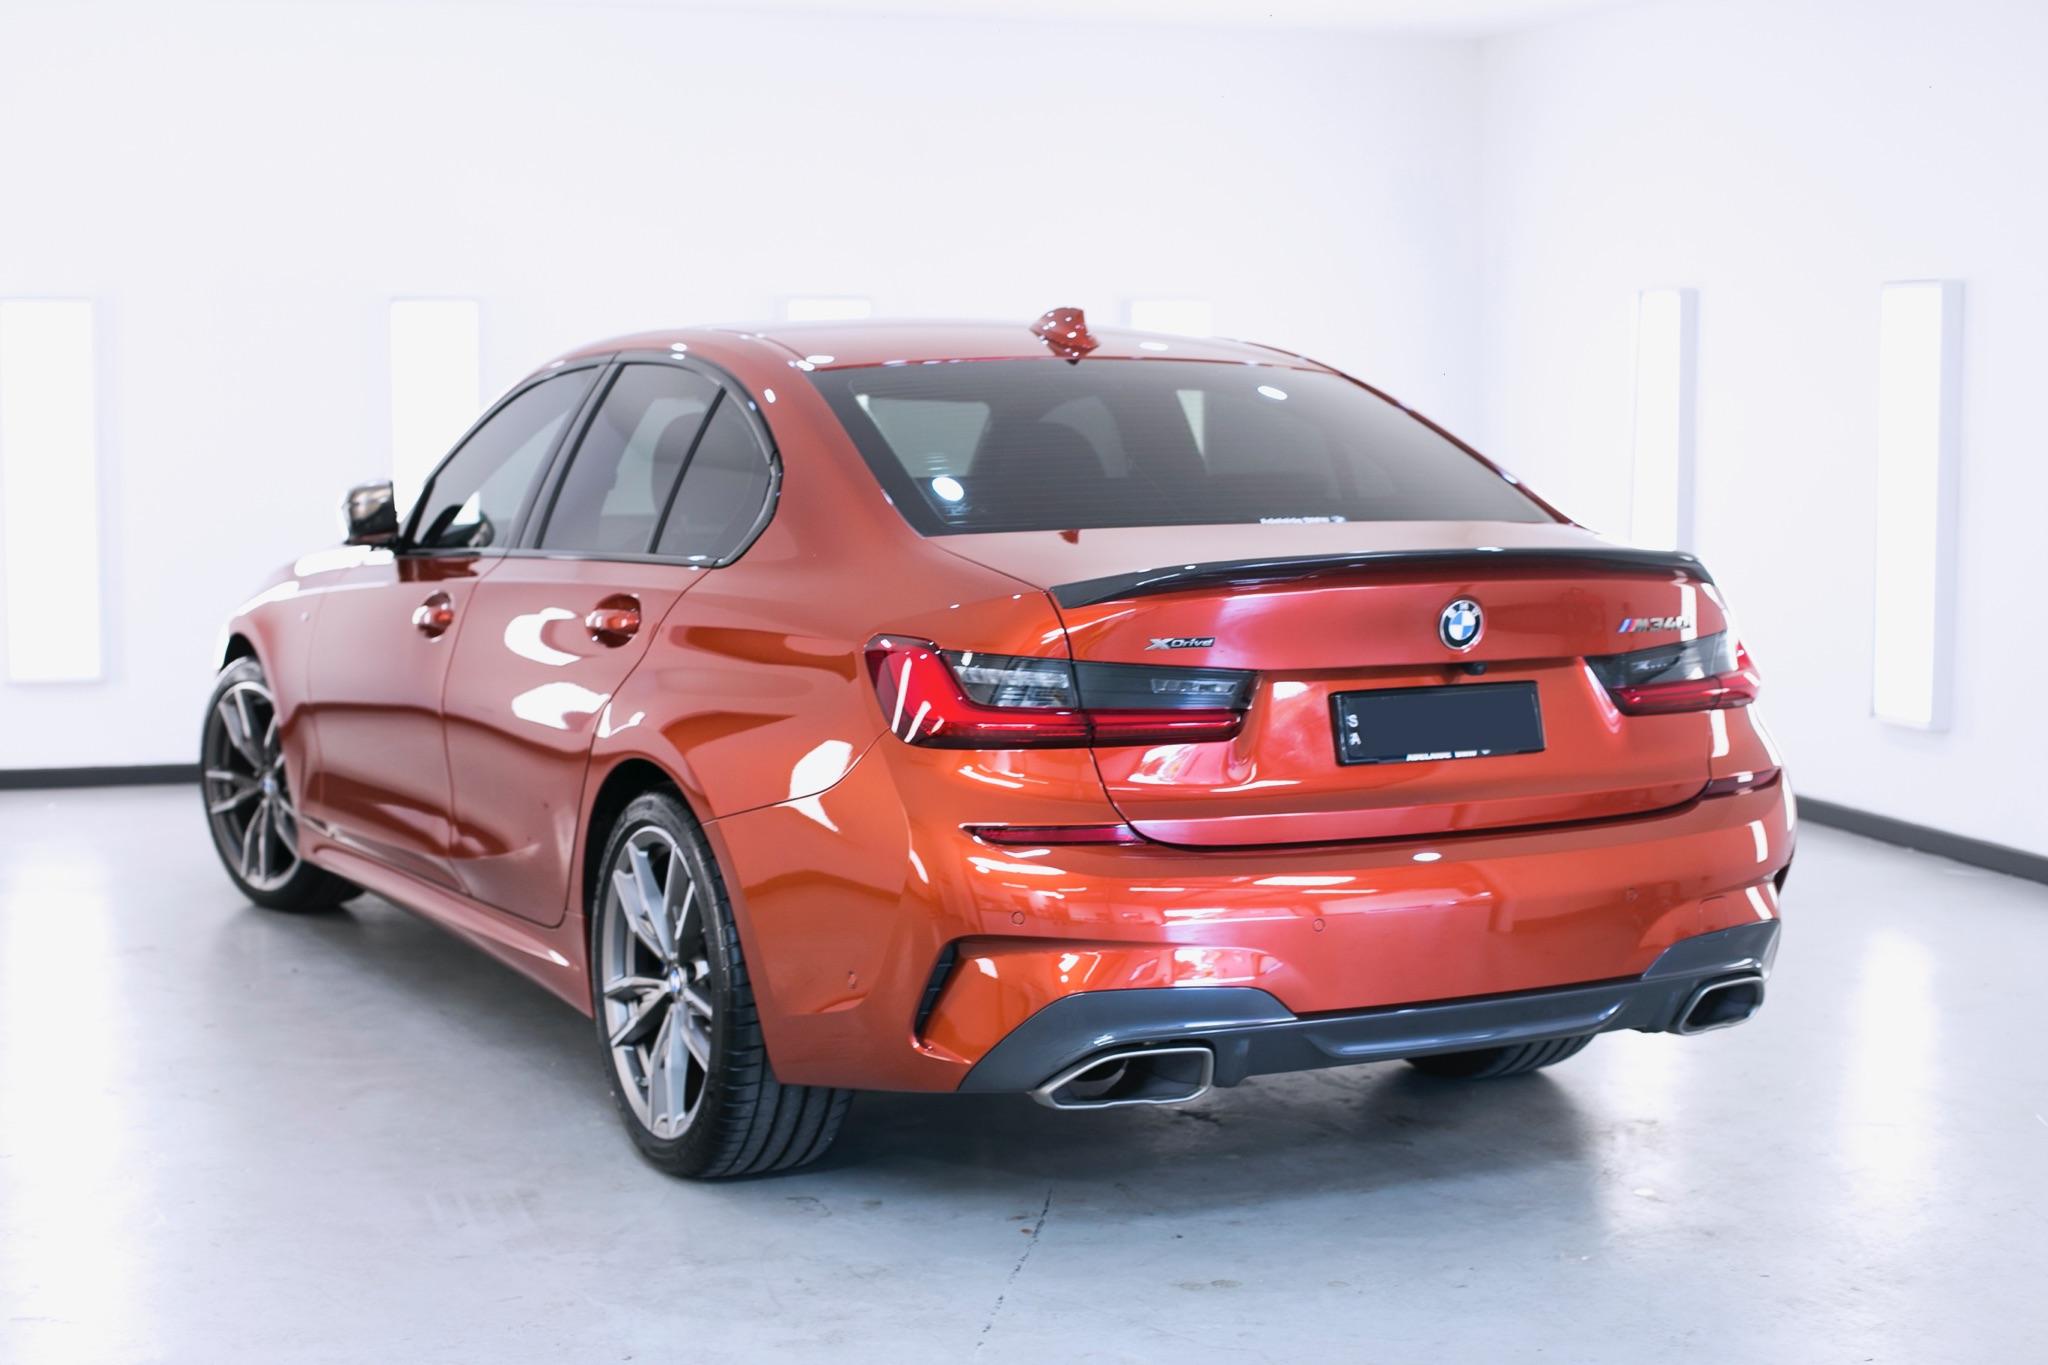 Spoilers BMW 51192458369 M Performance Rear Spoiler in Carbon ...